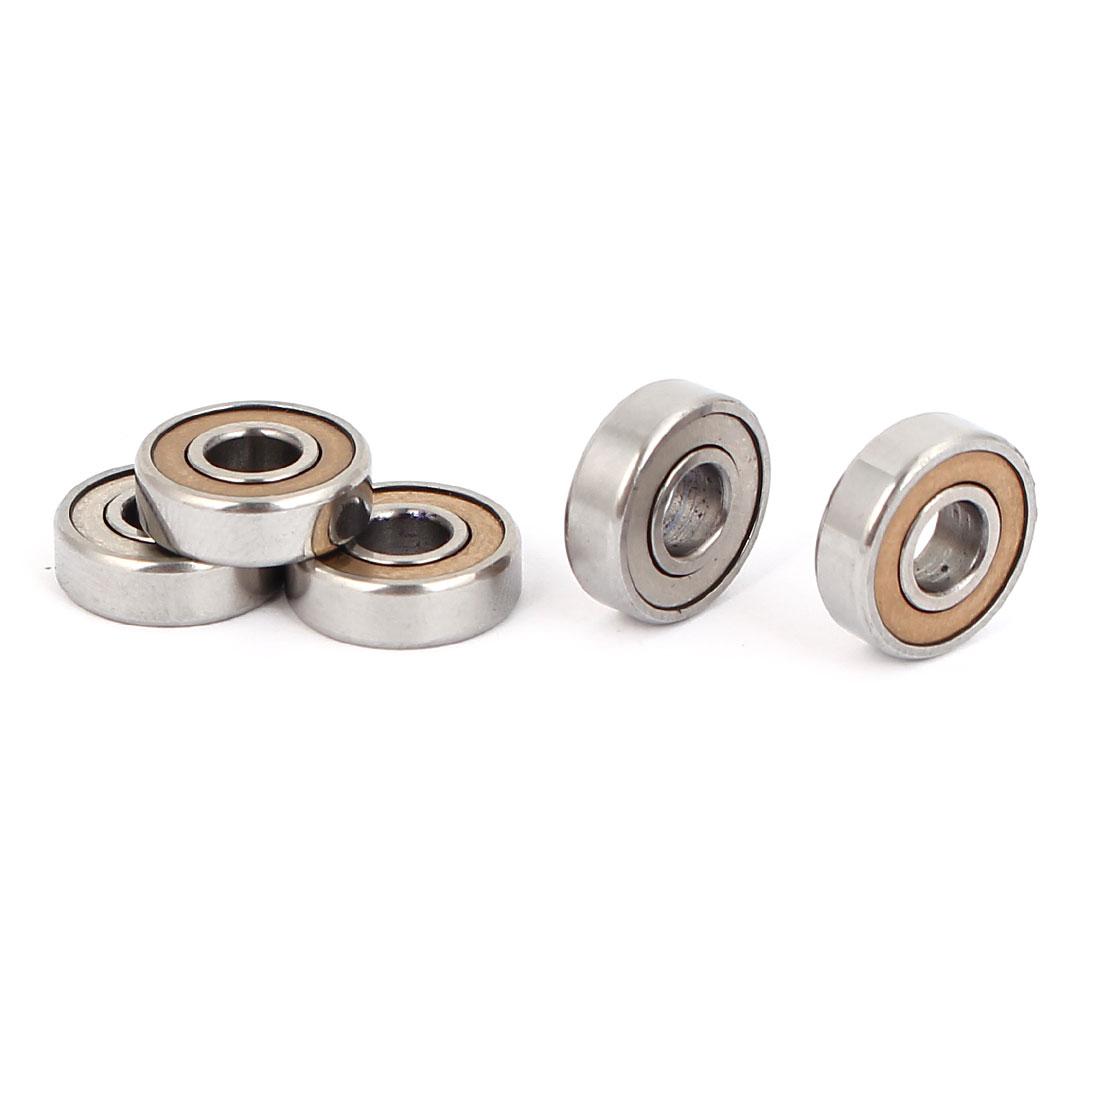 5mm x 13mm x 4mm Single Row Double Shielded Deep Groove Ball Bearings 5PCS